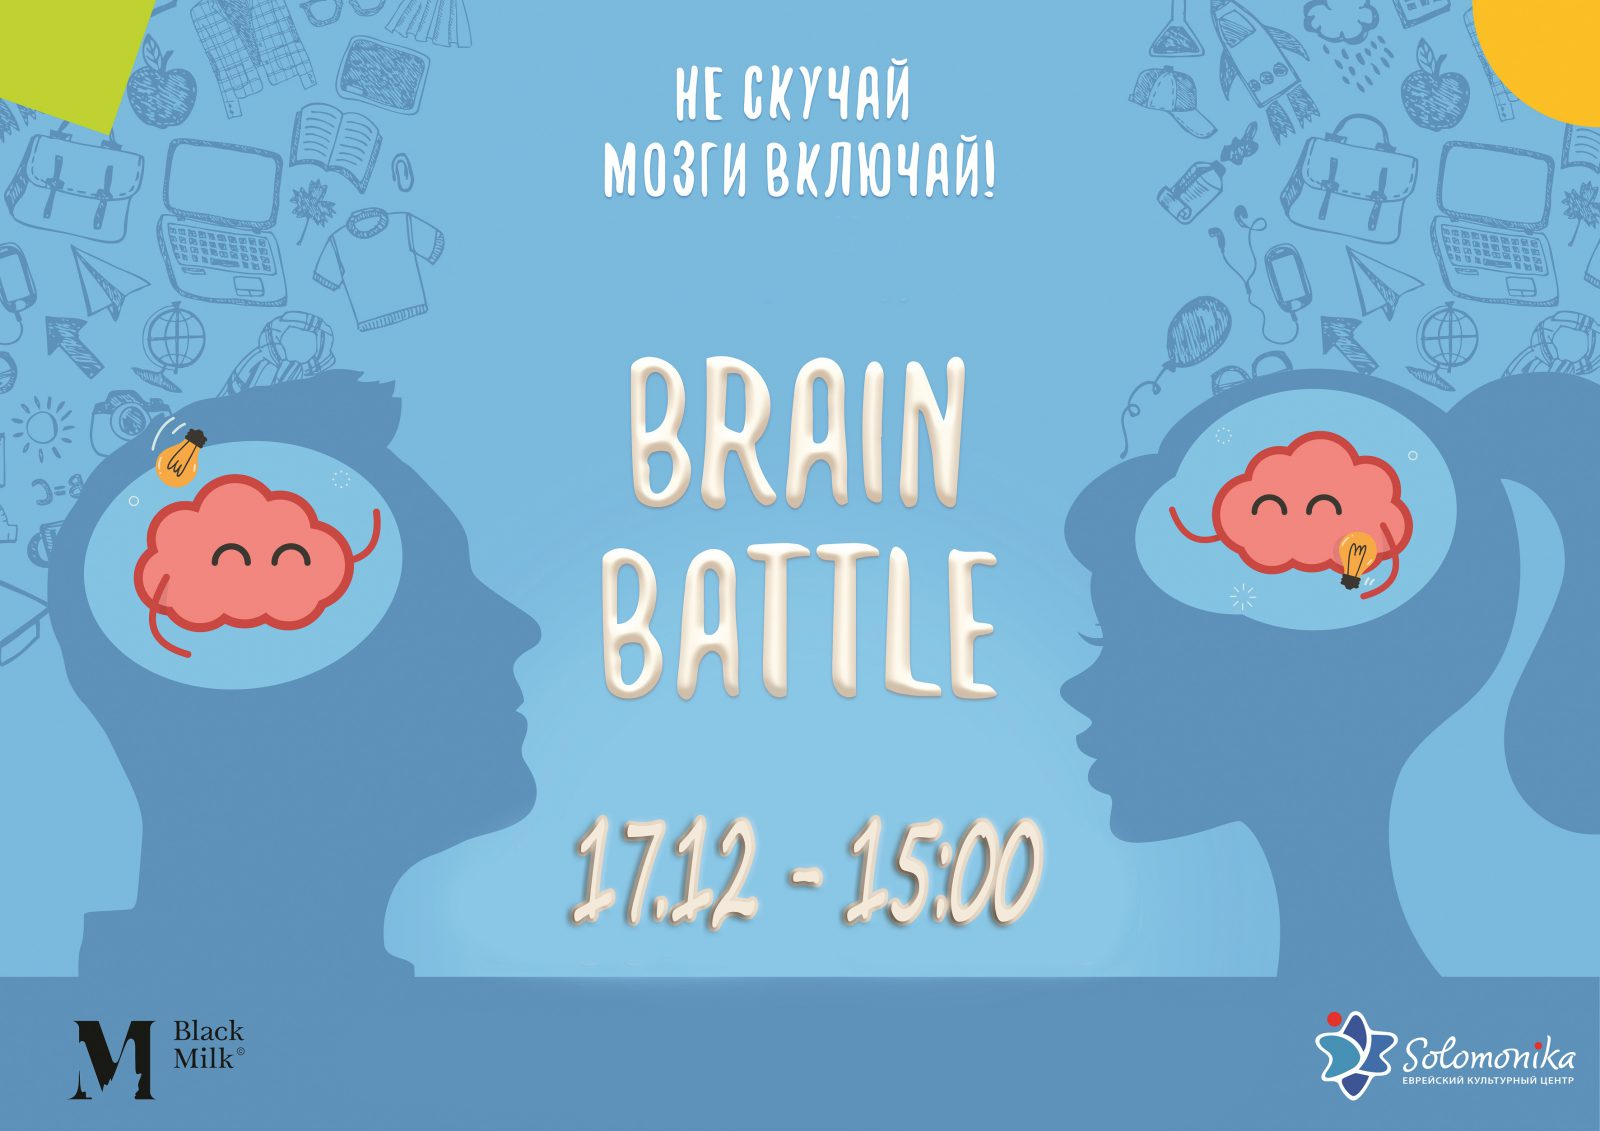 Brain Battle